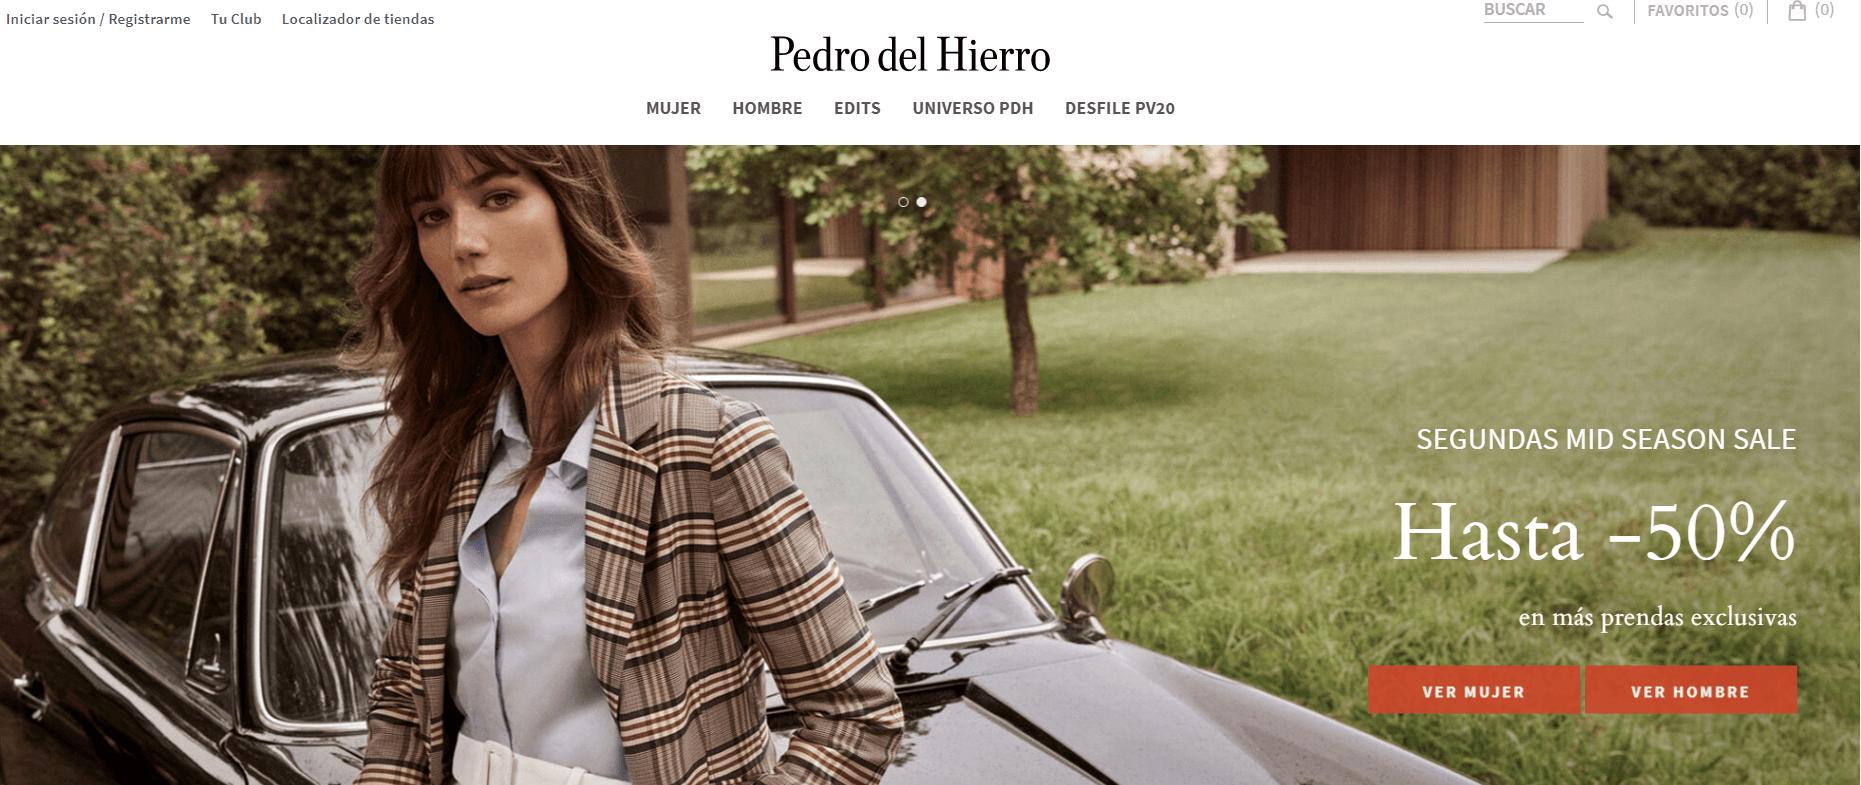 Pedro Del Hierro купити онлайн з доставкою в Україну - myMeest - 2